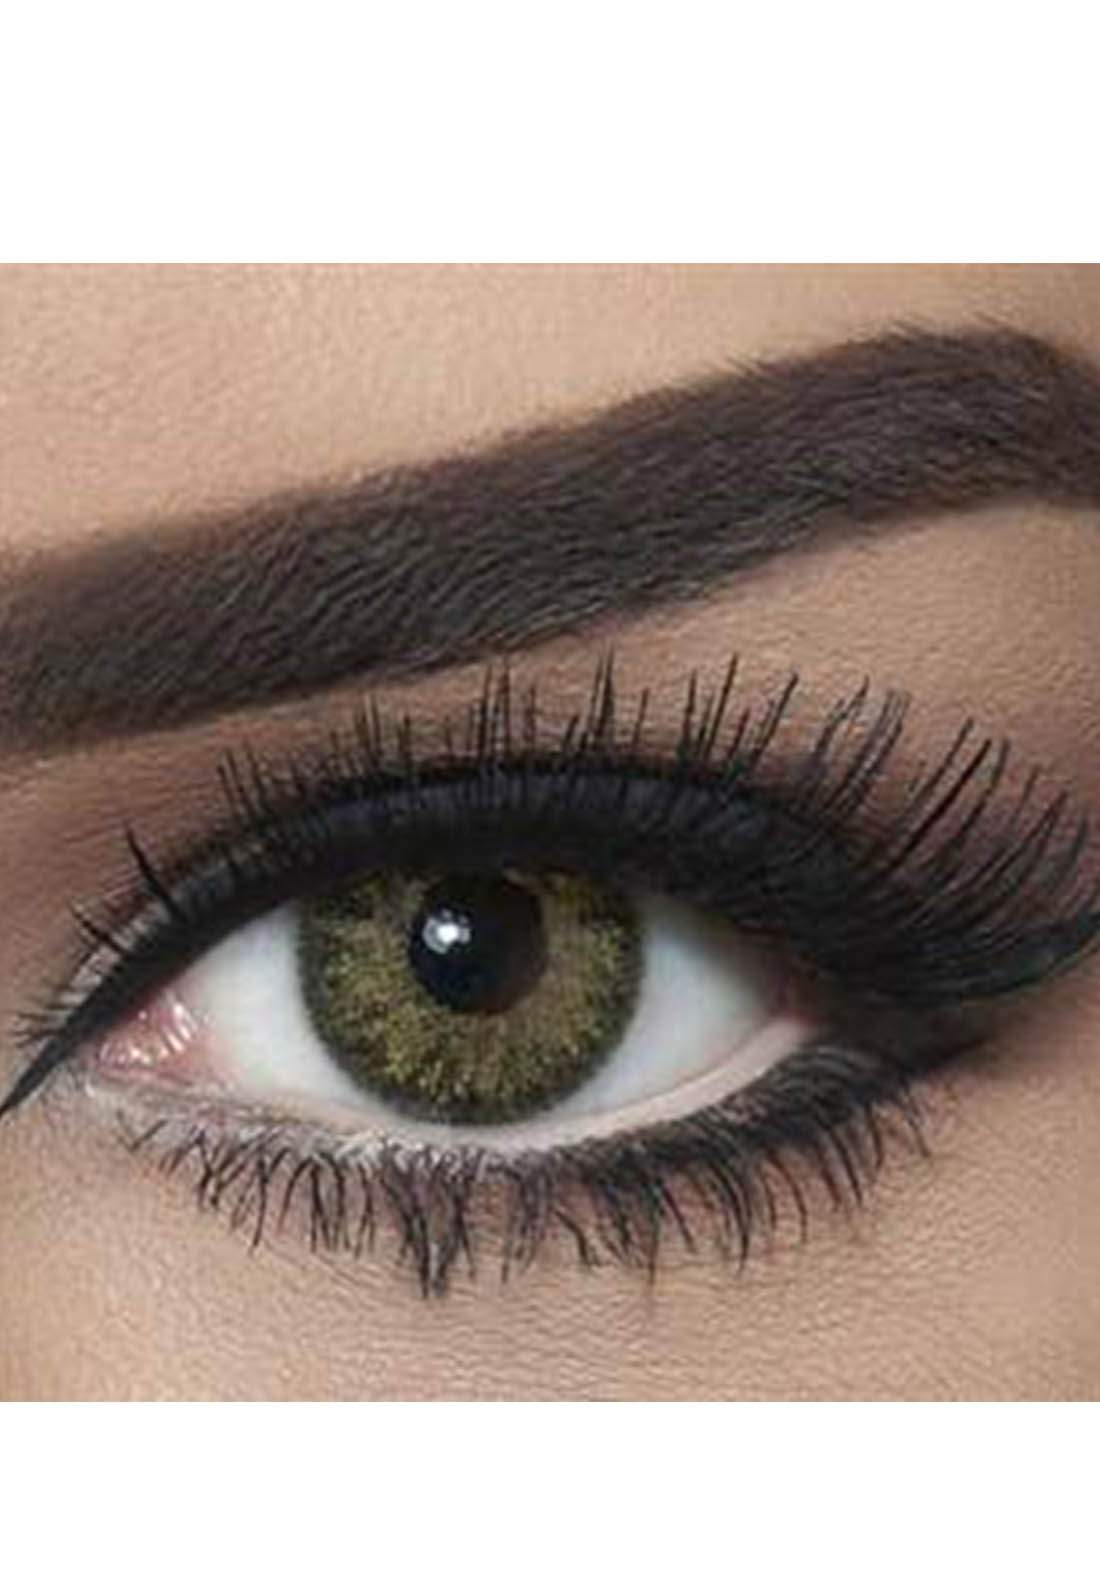 Bella Classic 301018 Contact Lenses 3 Months Use Natural - Green Yellow No.20 عدسات لاصقة